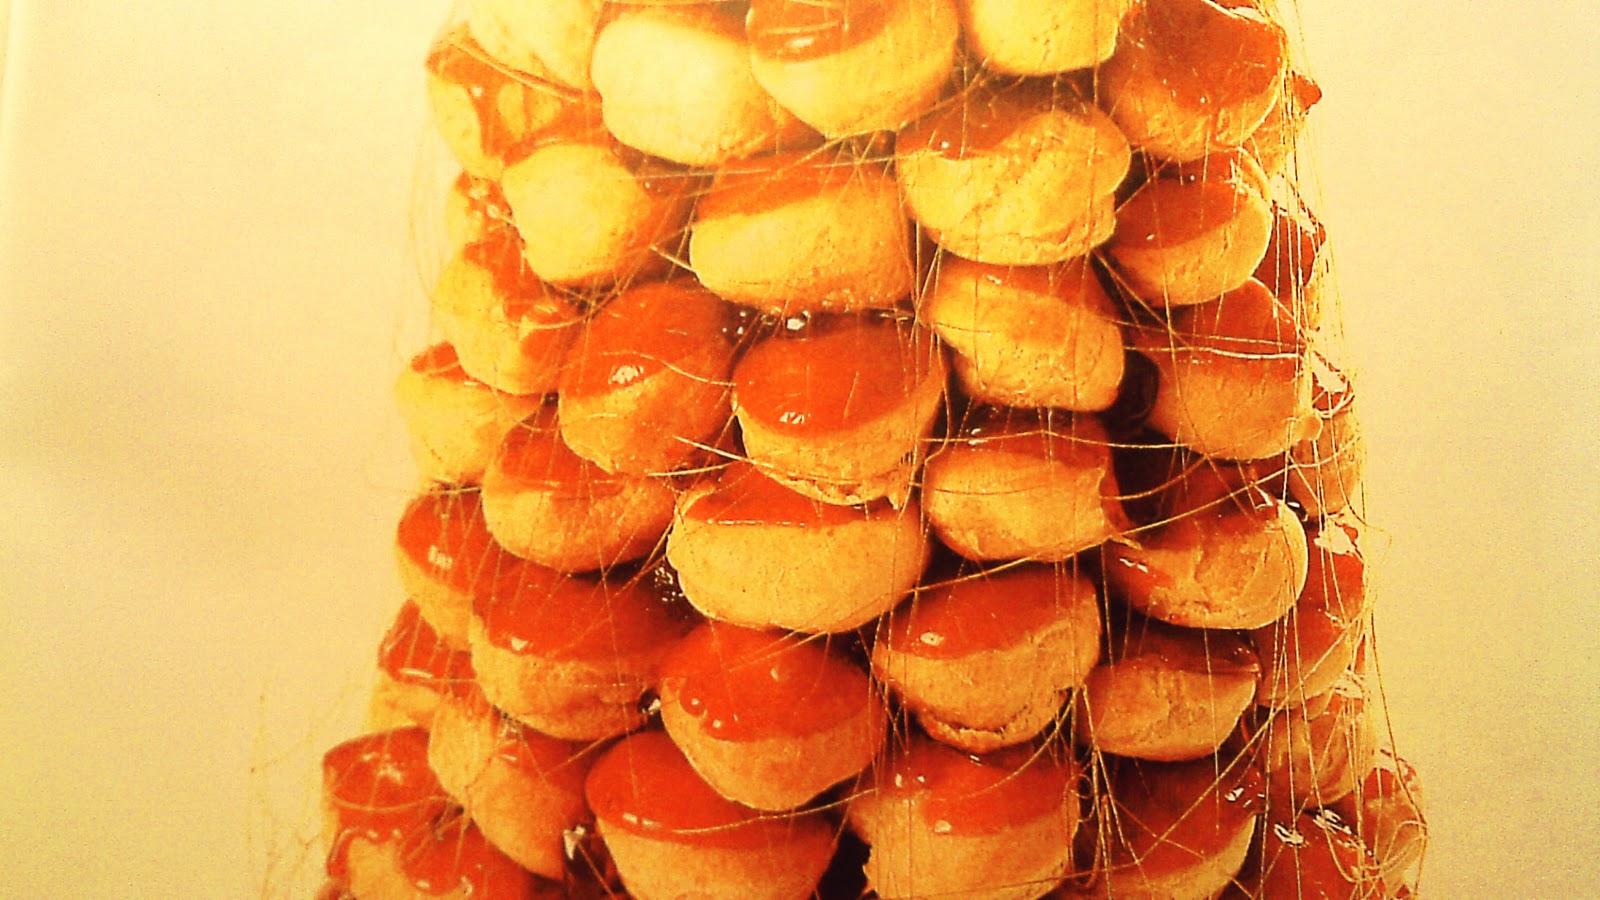 Huba reposter a profiteroles rellenos - Profiteroles salados rellenos ...